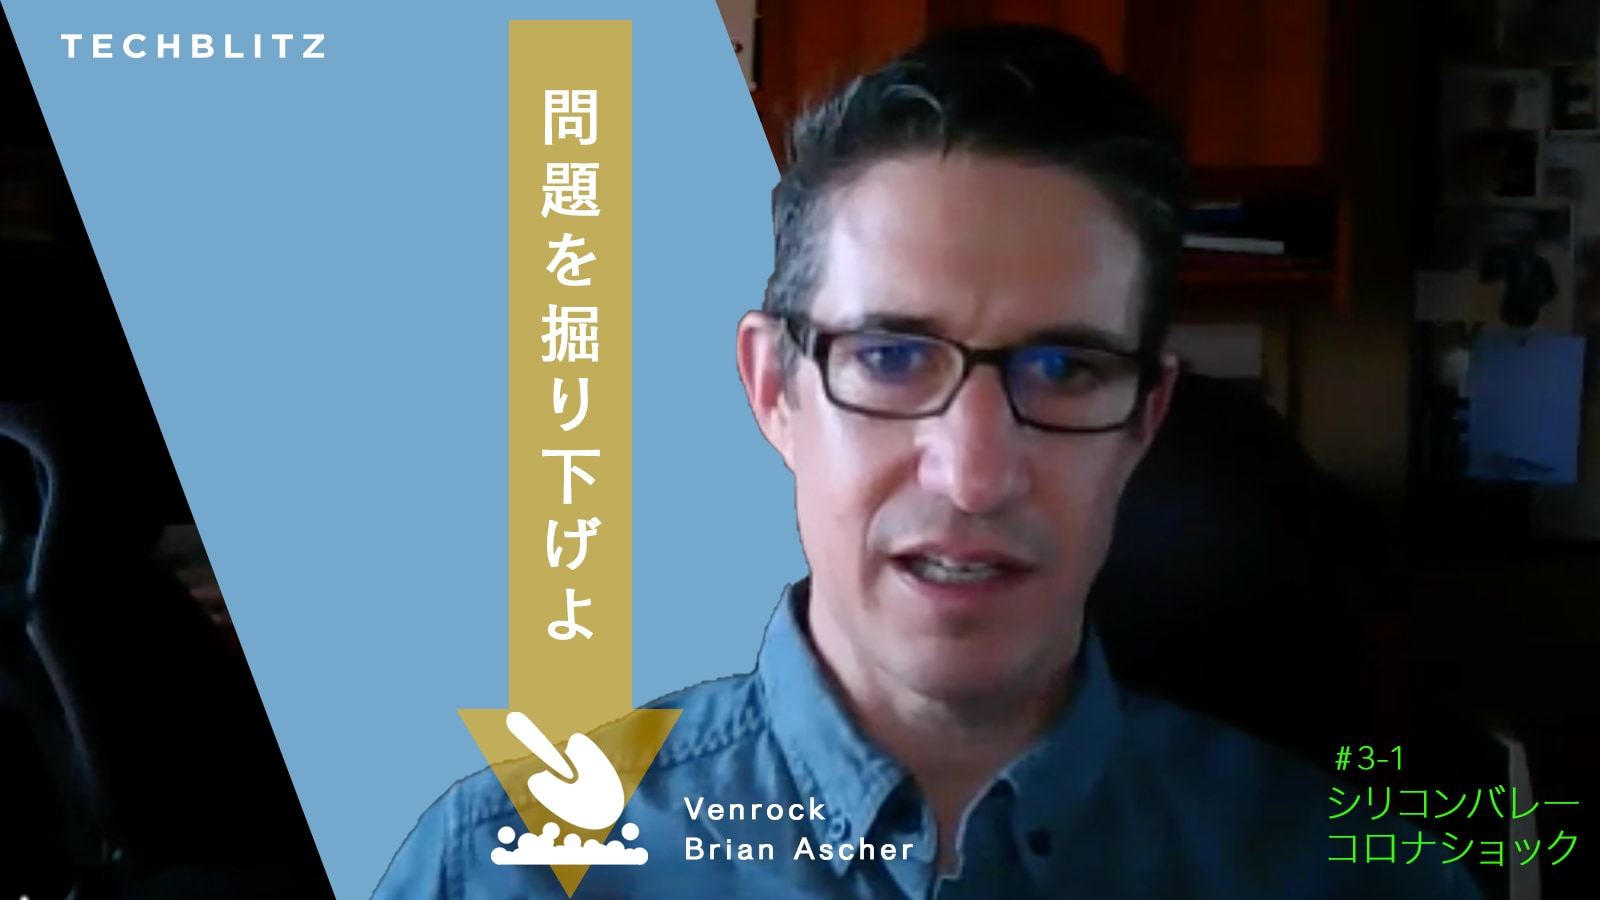 【Venrock】シリコンバレーの名門VCが語る、SaaSスタートアップ投資の原則